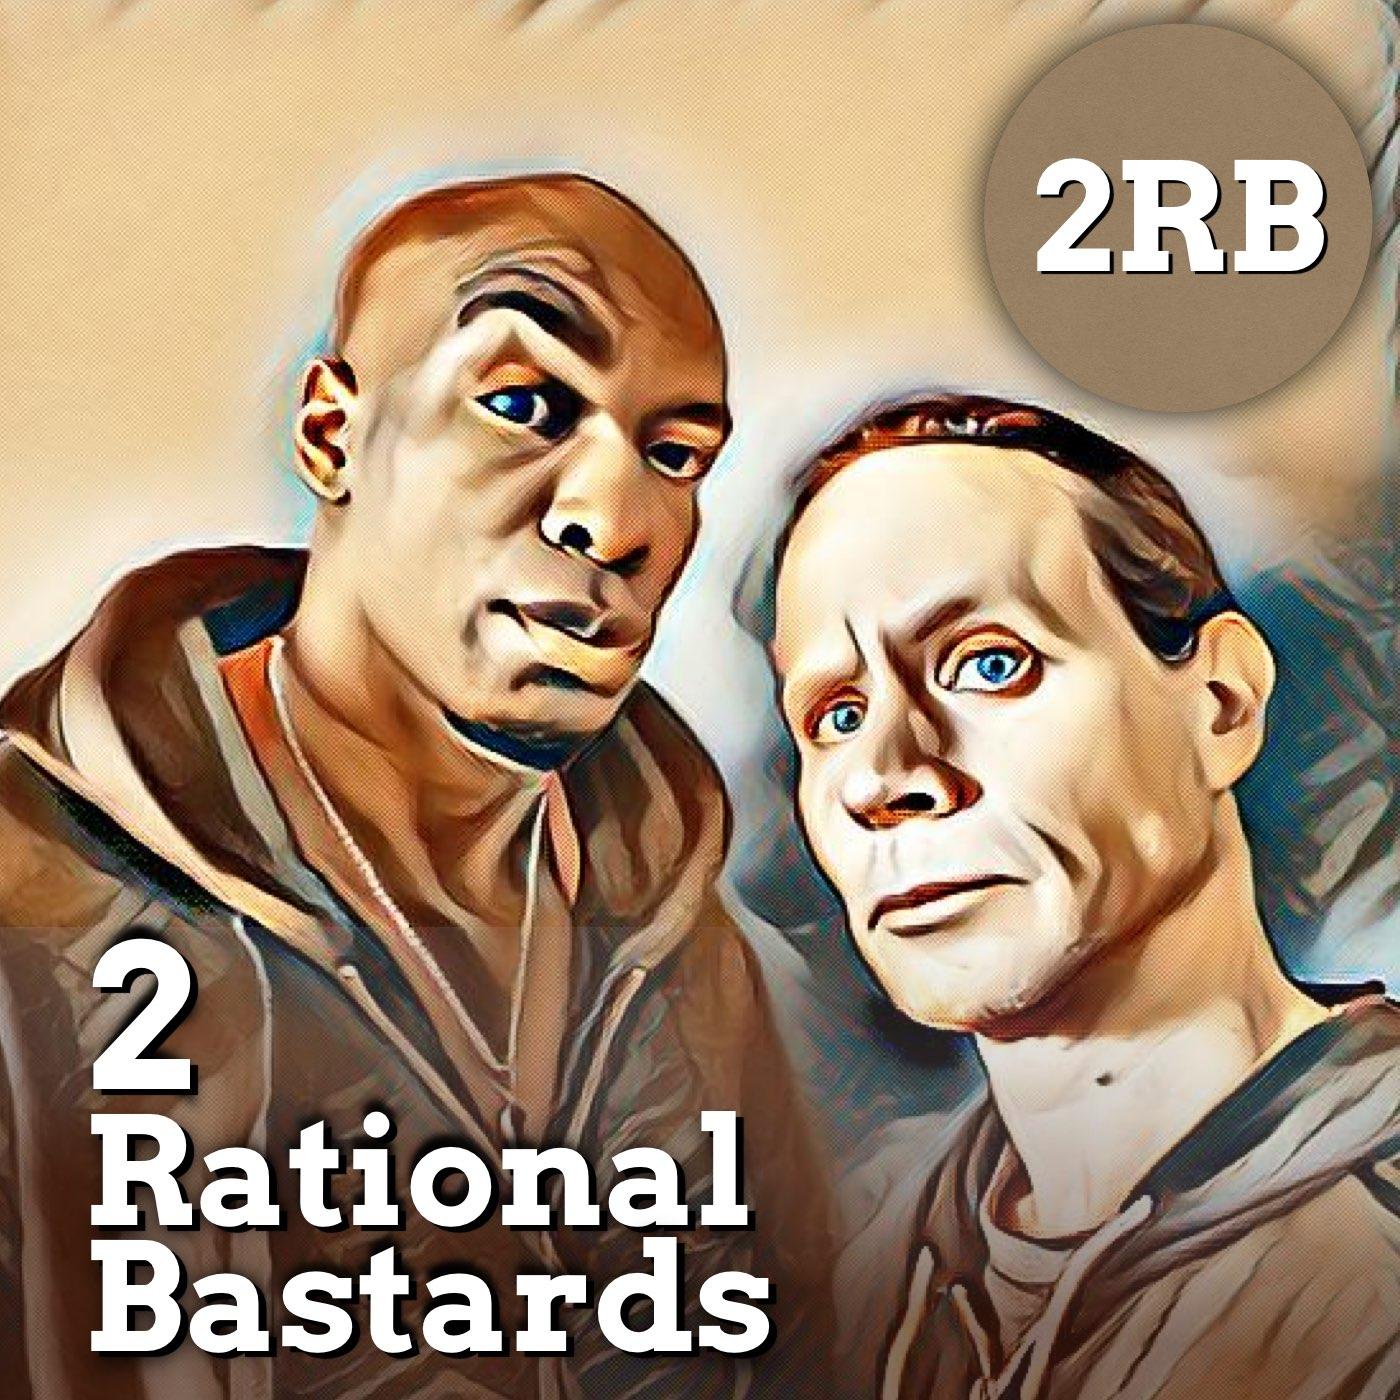 2 Rational Bastards show art